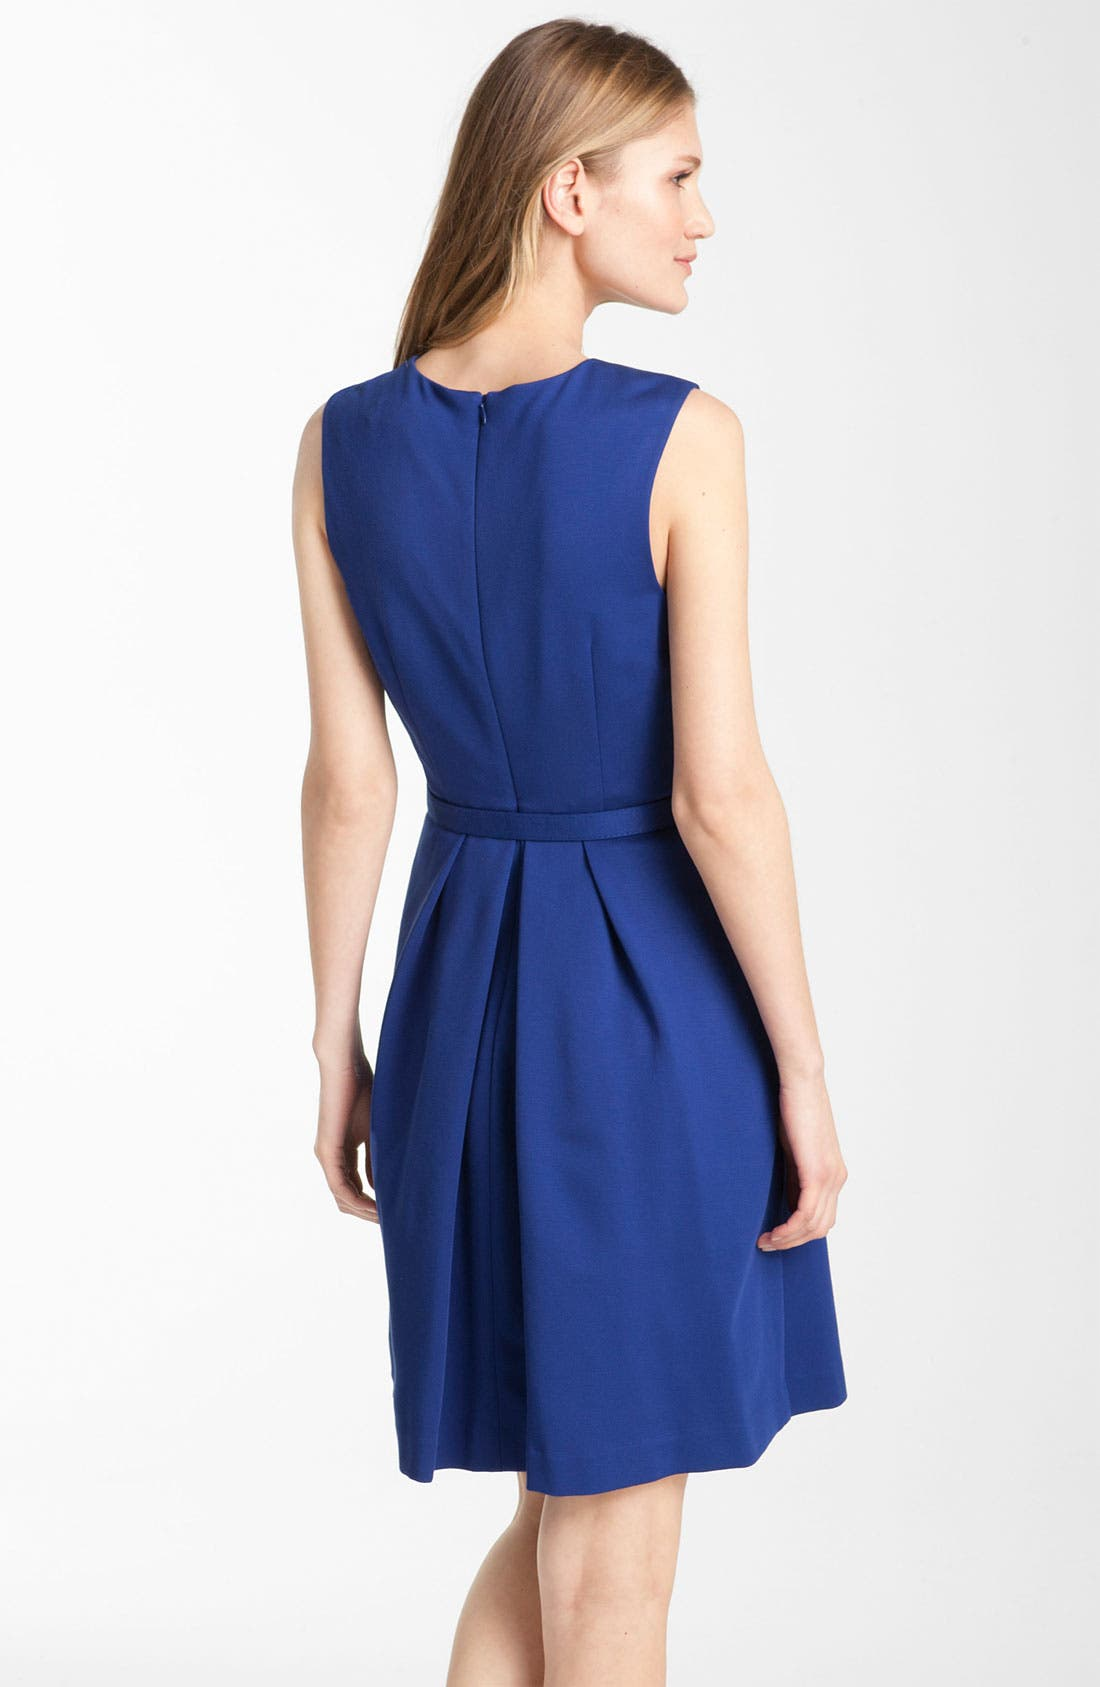 Alternate Image 2  - Trina Turk 'Princess' Ponte Knit Dress (Online Exclusive)